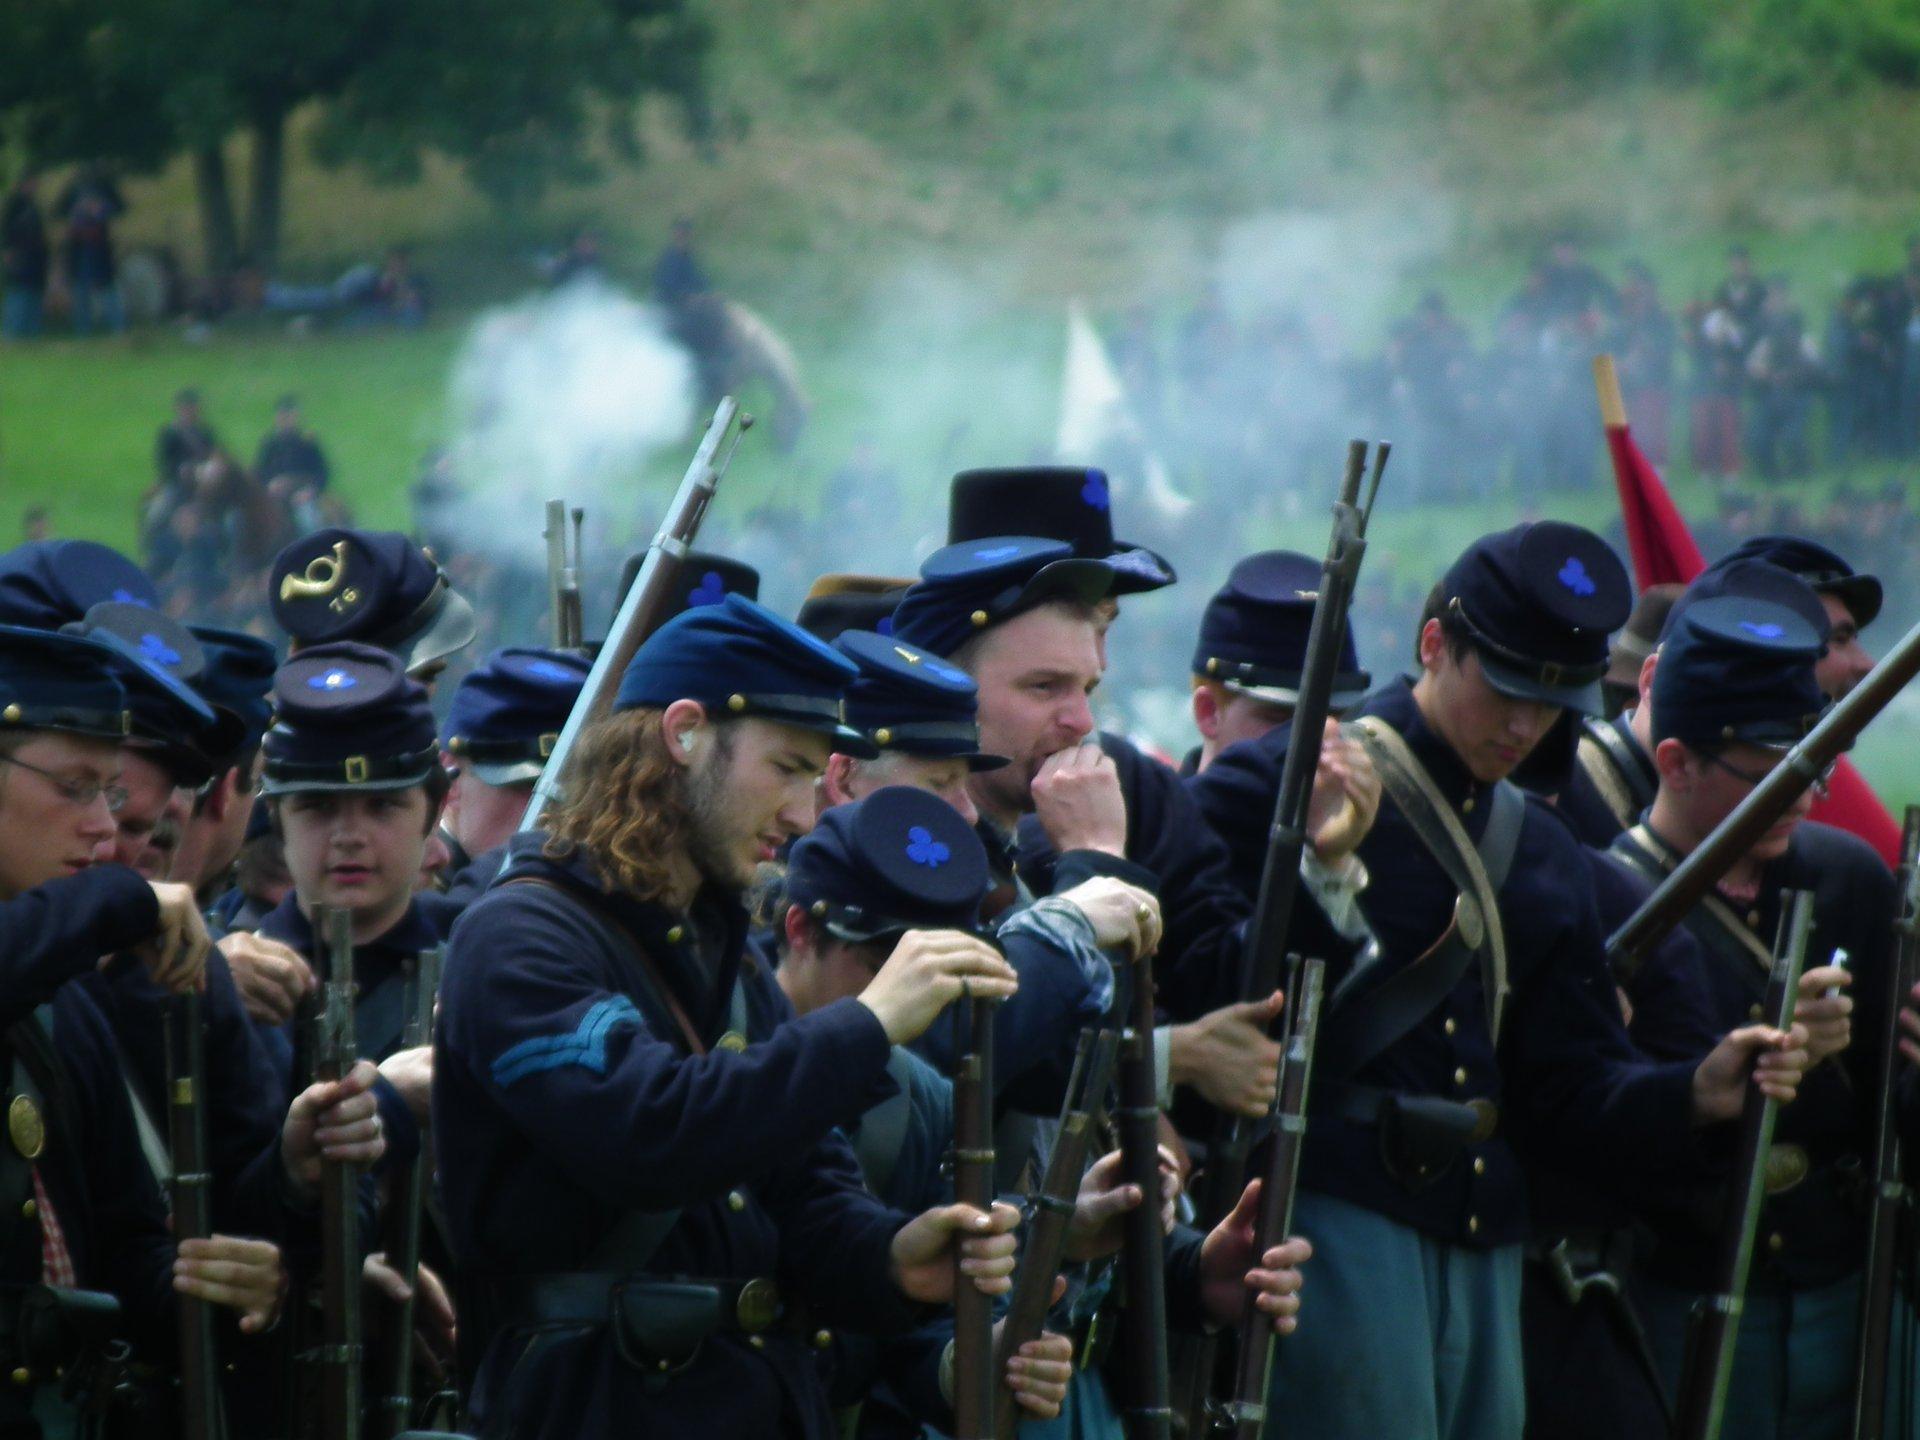 Best time for Gettysburg Civil War Battle Reenactment 2020